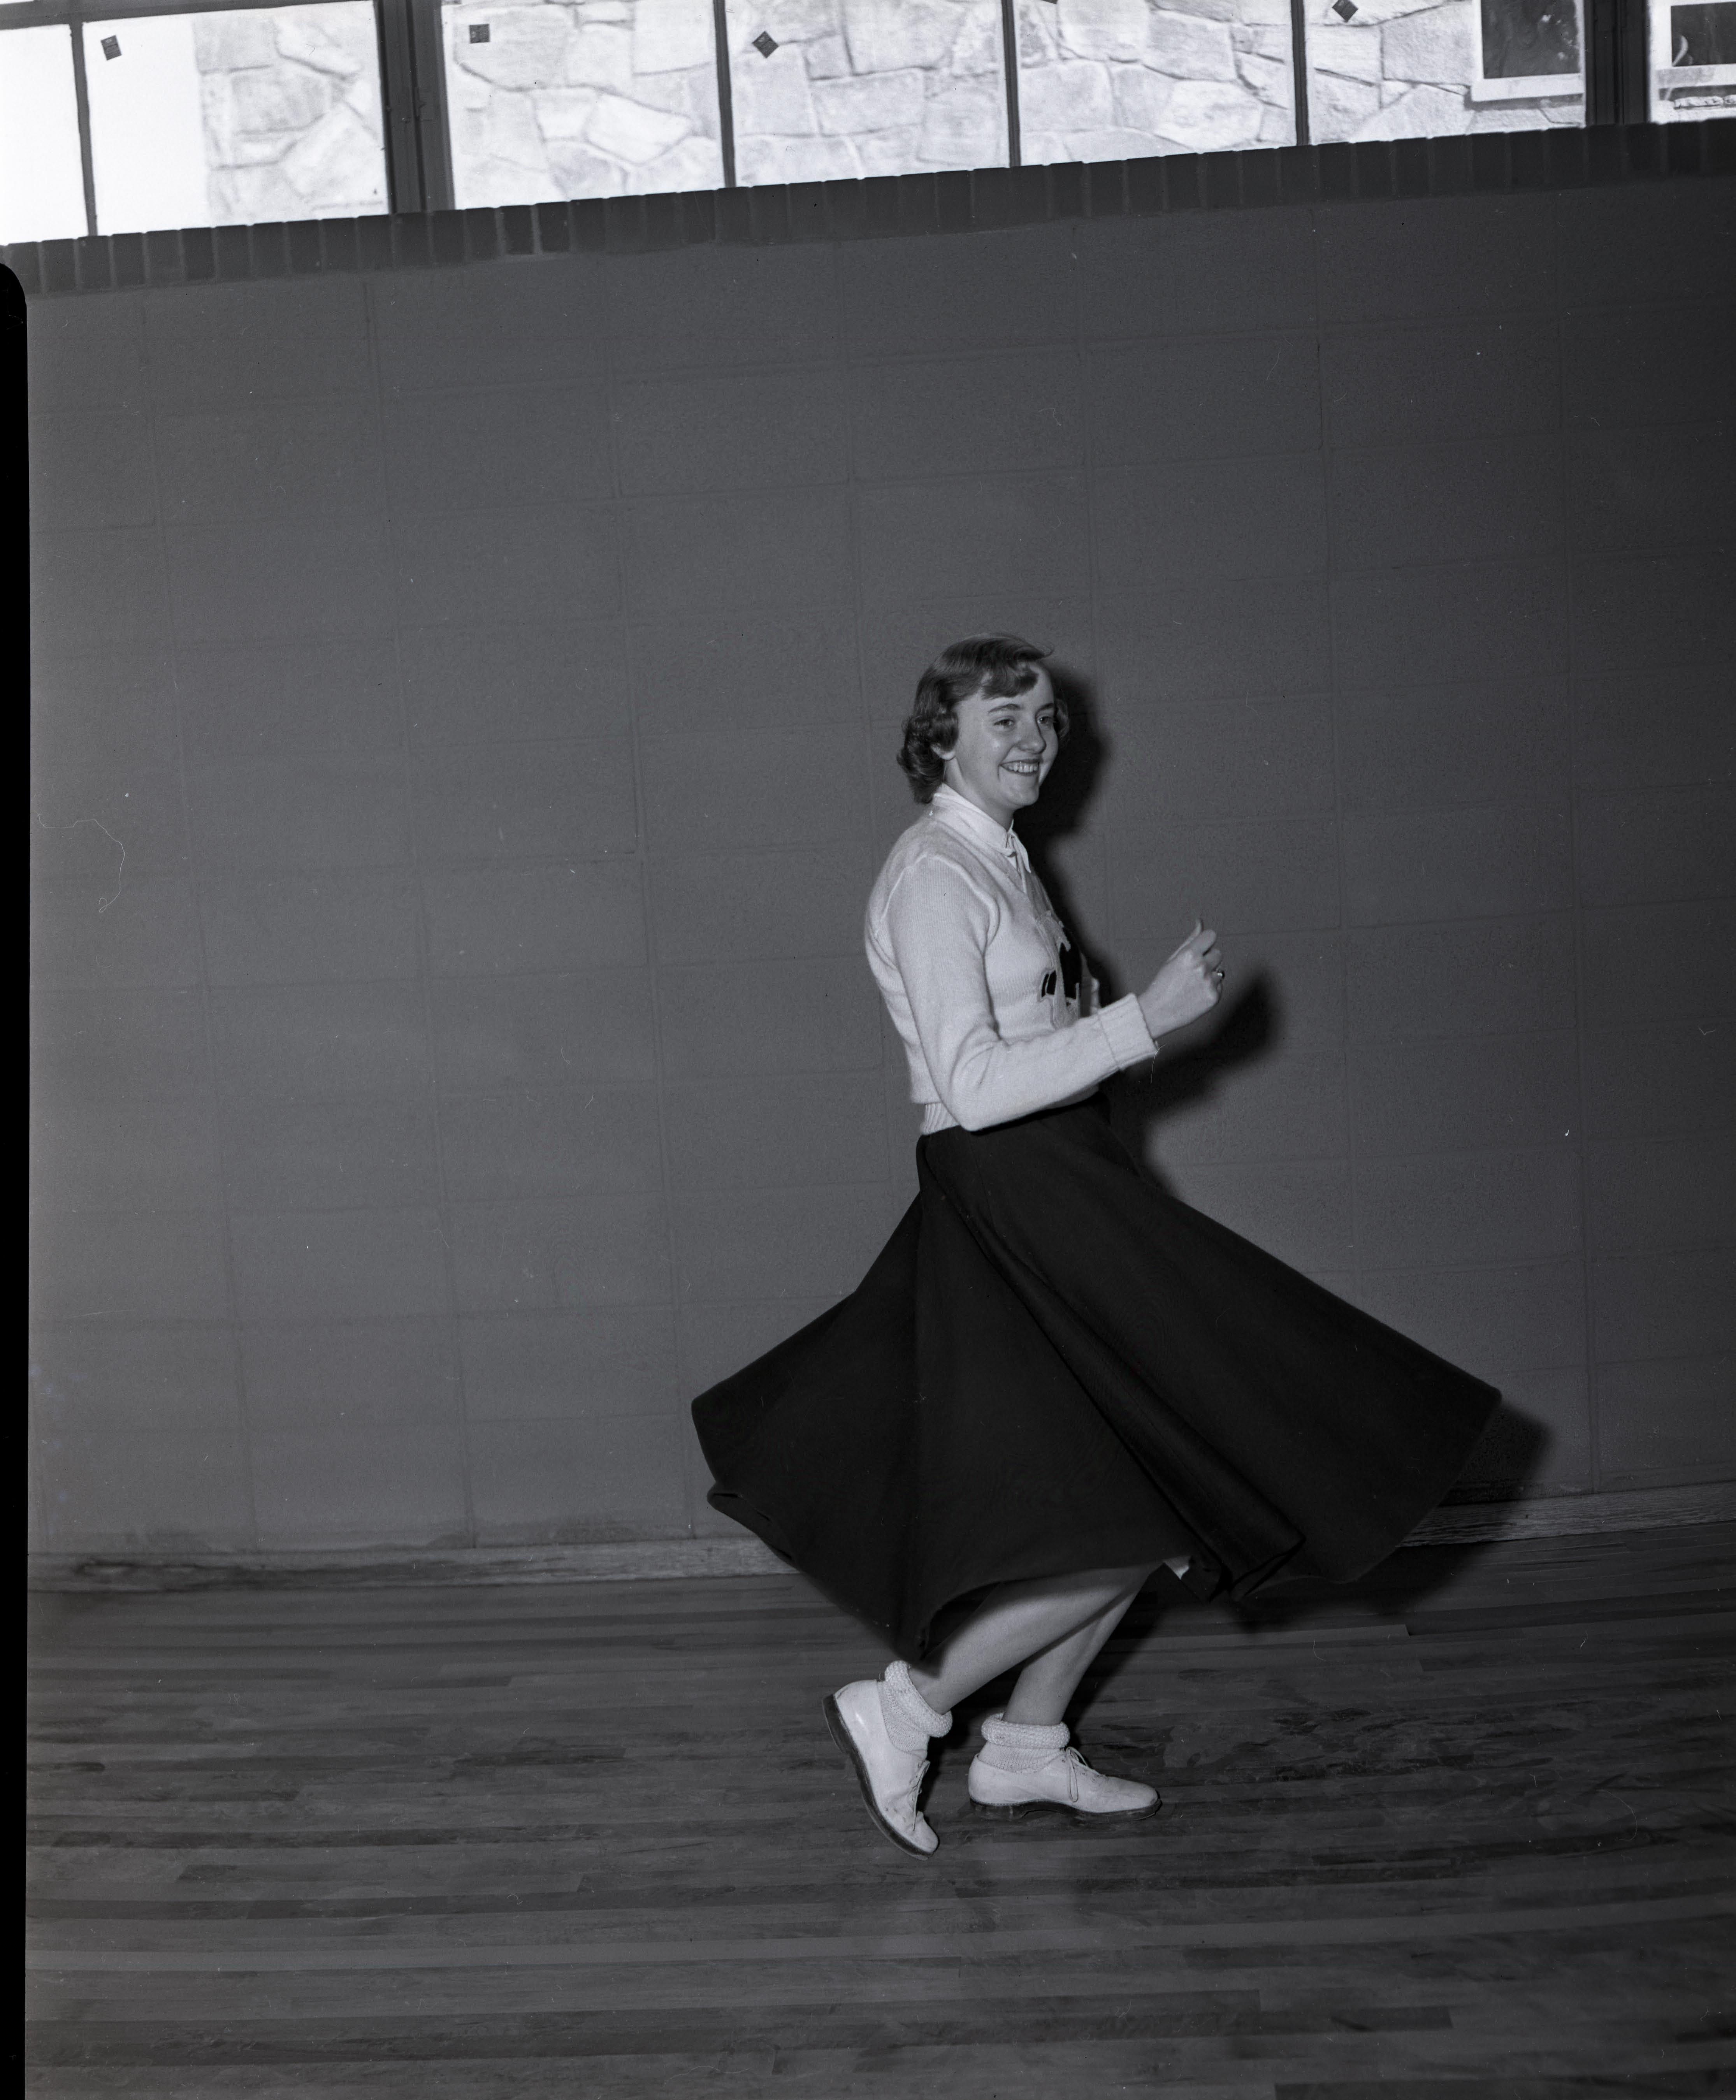 Cove Creek High School cheerleader, 1957.